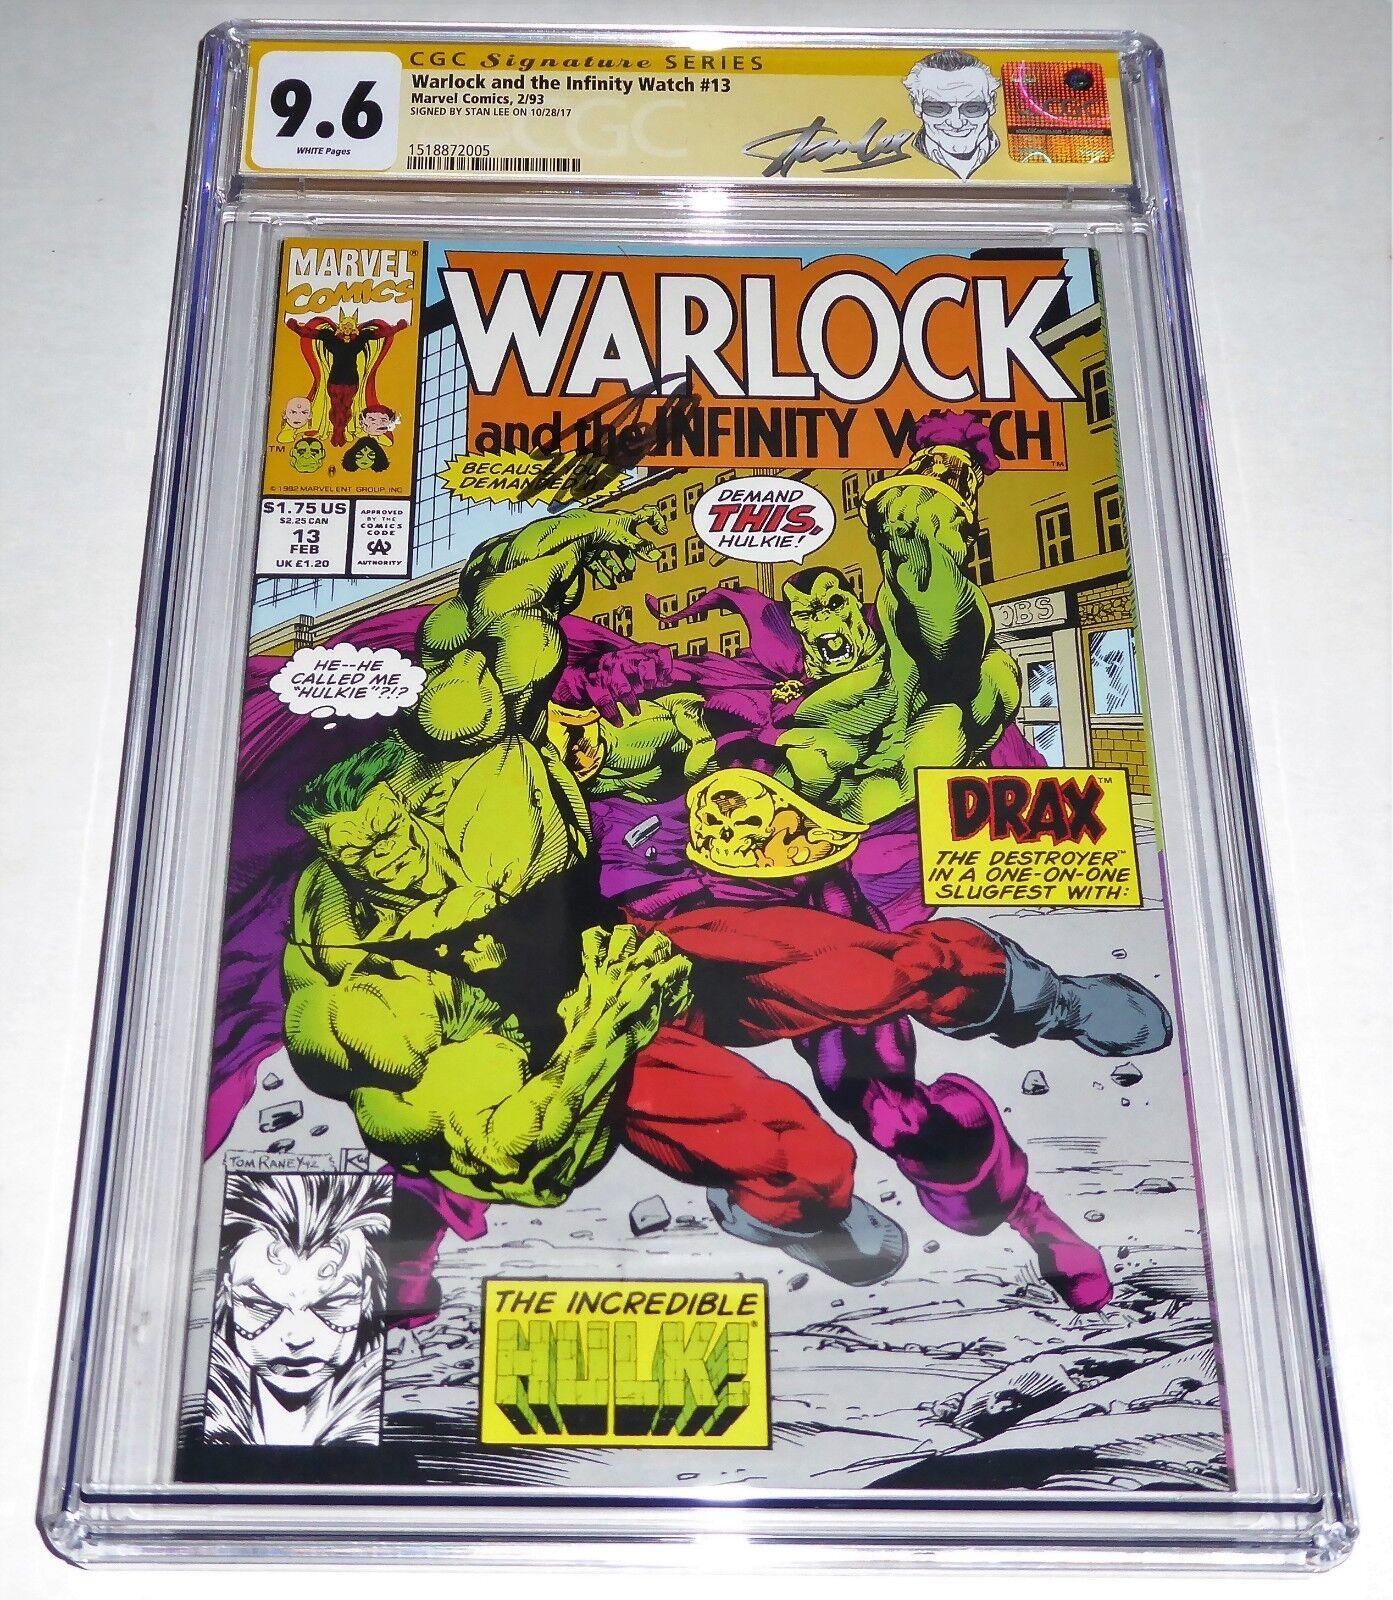 Warlock and the Infinity Watch #13 CGC SS Signature Autograph STAN LEE Hulk Drax